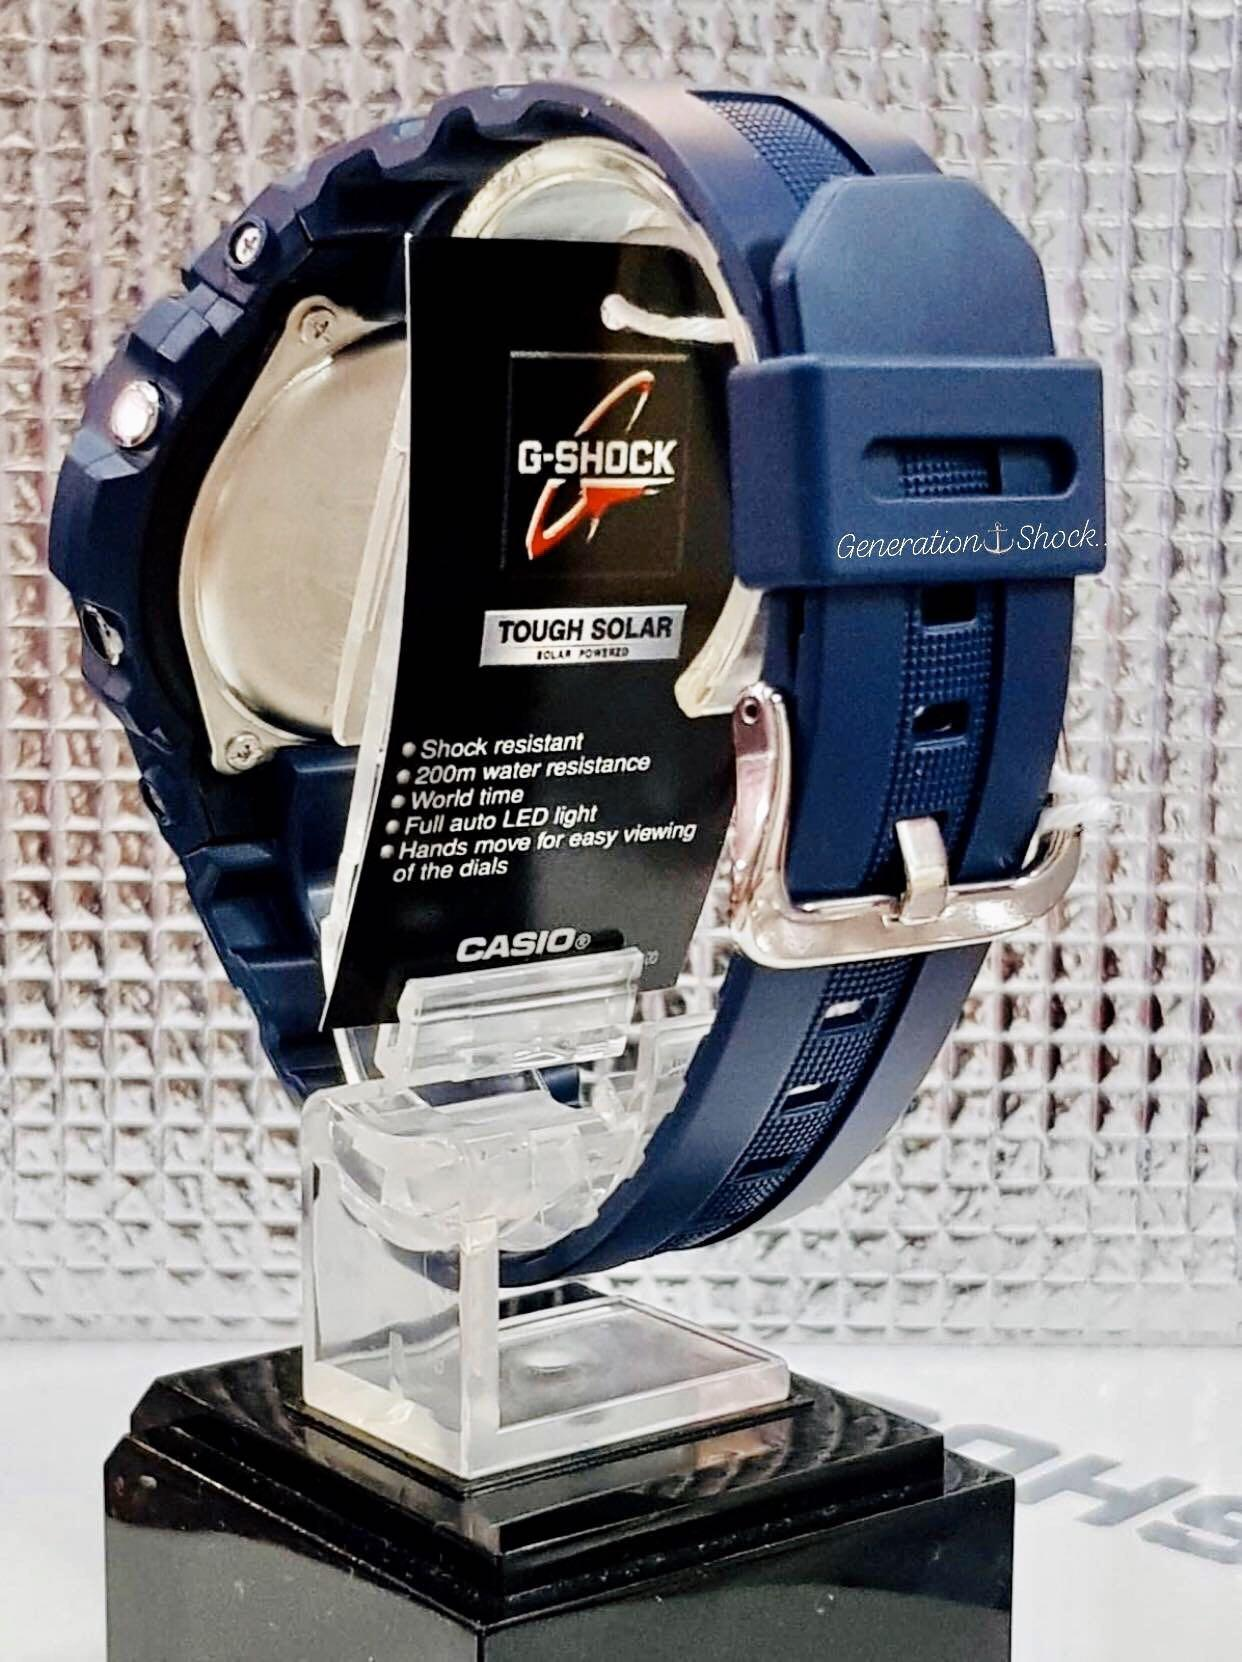 NEW🌟TOUGH☀️SOLAR : GSHOCK DIVER UNISEX SPORTS WATCH : 100% ORIGINAL AUTHENTIC CASIO G-SHOCK : AWR-M100SNR-2A / AWRM100SNR-2A (ROYAL BLUE ROSE-GOLD)